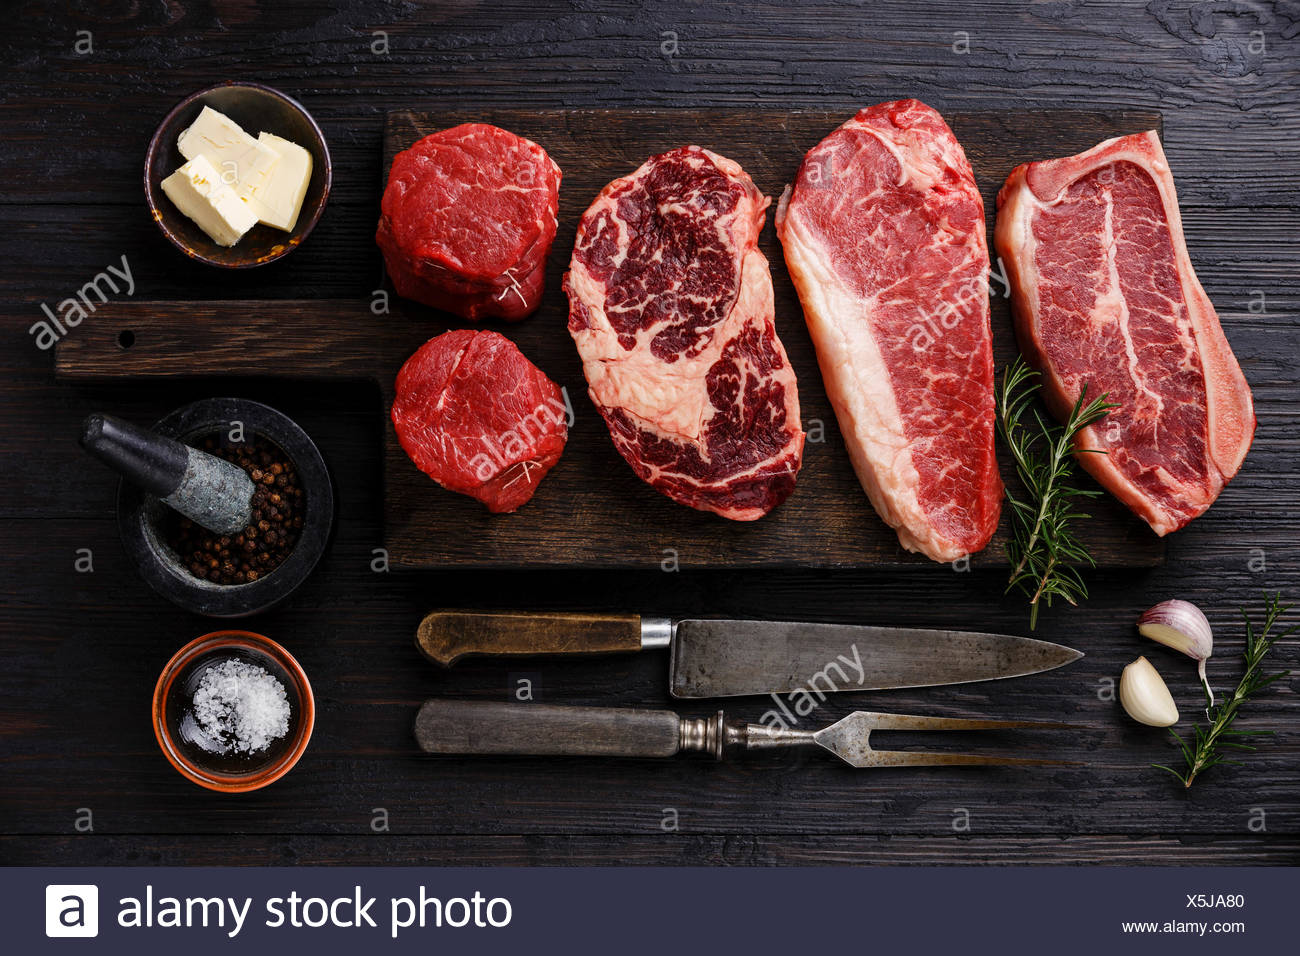 Variety of Raw Black Angus Prime meat steaks Blade on bone, Striploin, Rib eye, Tenderloin fillet mignon on wooden board and seasoning - Stock Image